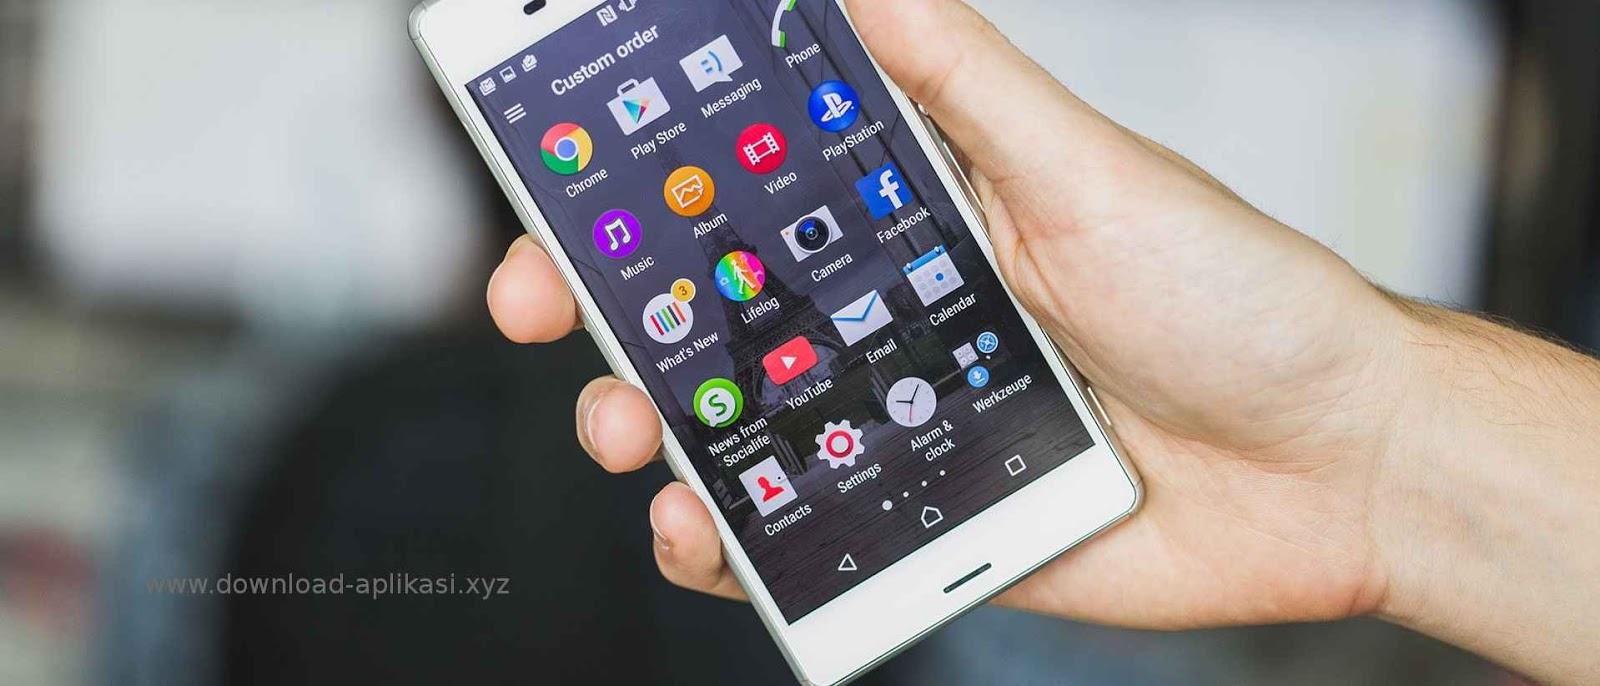 9 Aplikasi Android Terbaru Paling Keren Sepanjang Masa Download